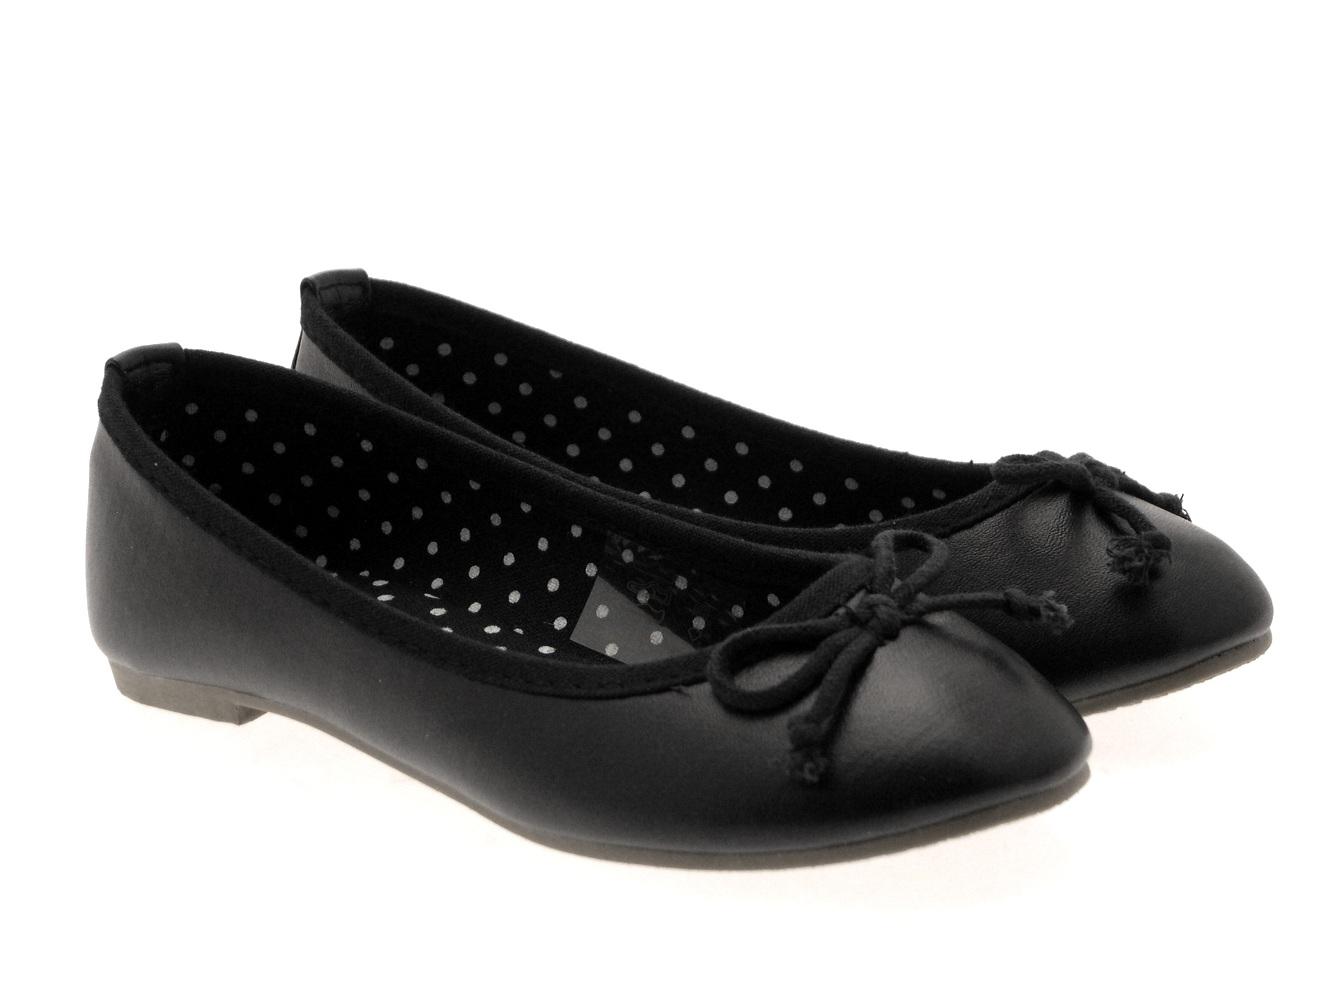 Girls Faux Leather Ballet Pumps Flat Kids Party Shoes 3D Bow Ballerinas Size